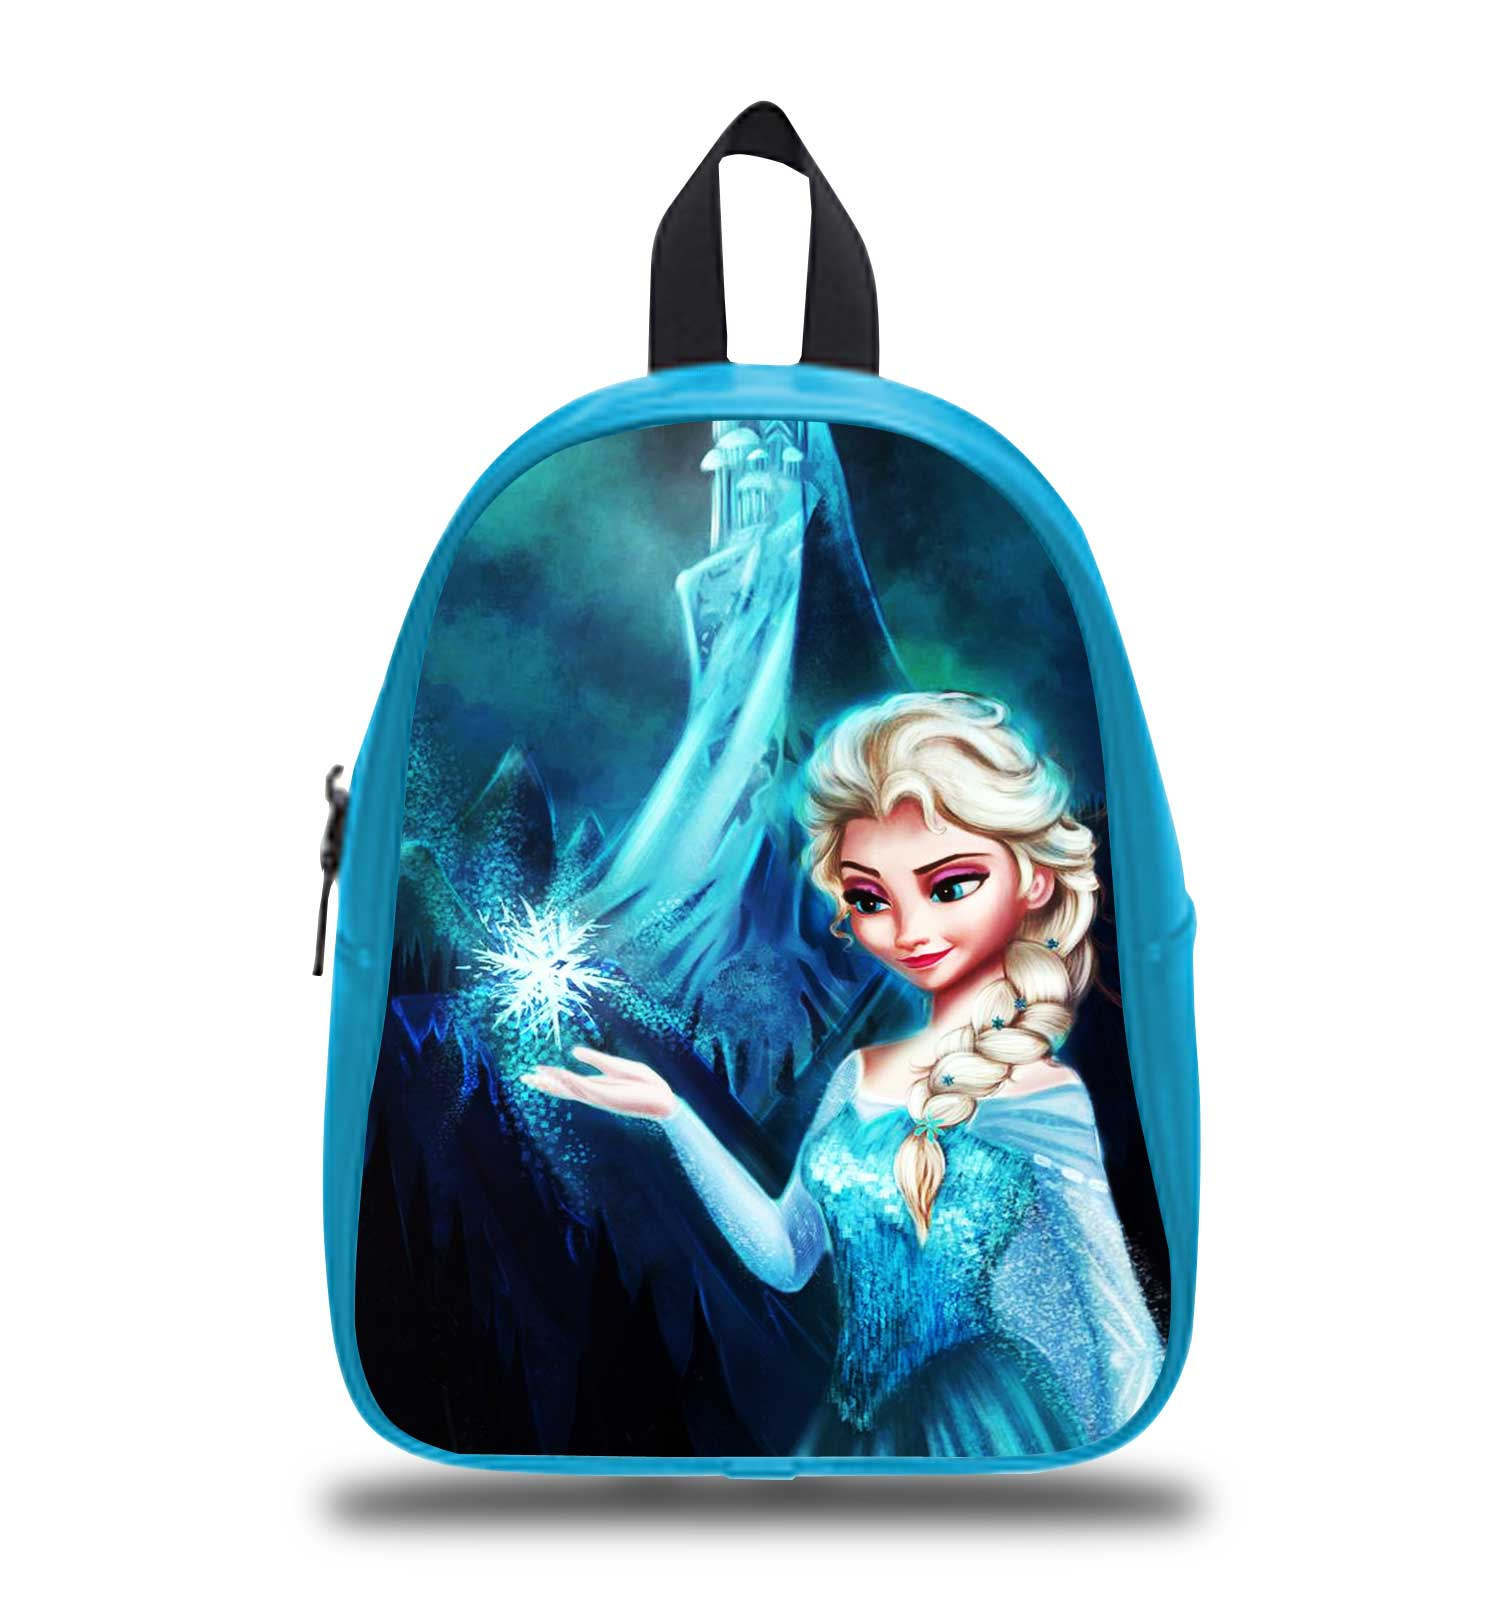 Frozen Elsa Disney Schoolbag Backpack S M L Kids School Bag ...